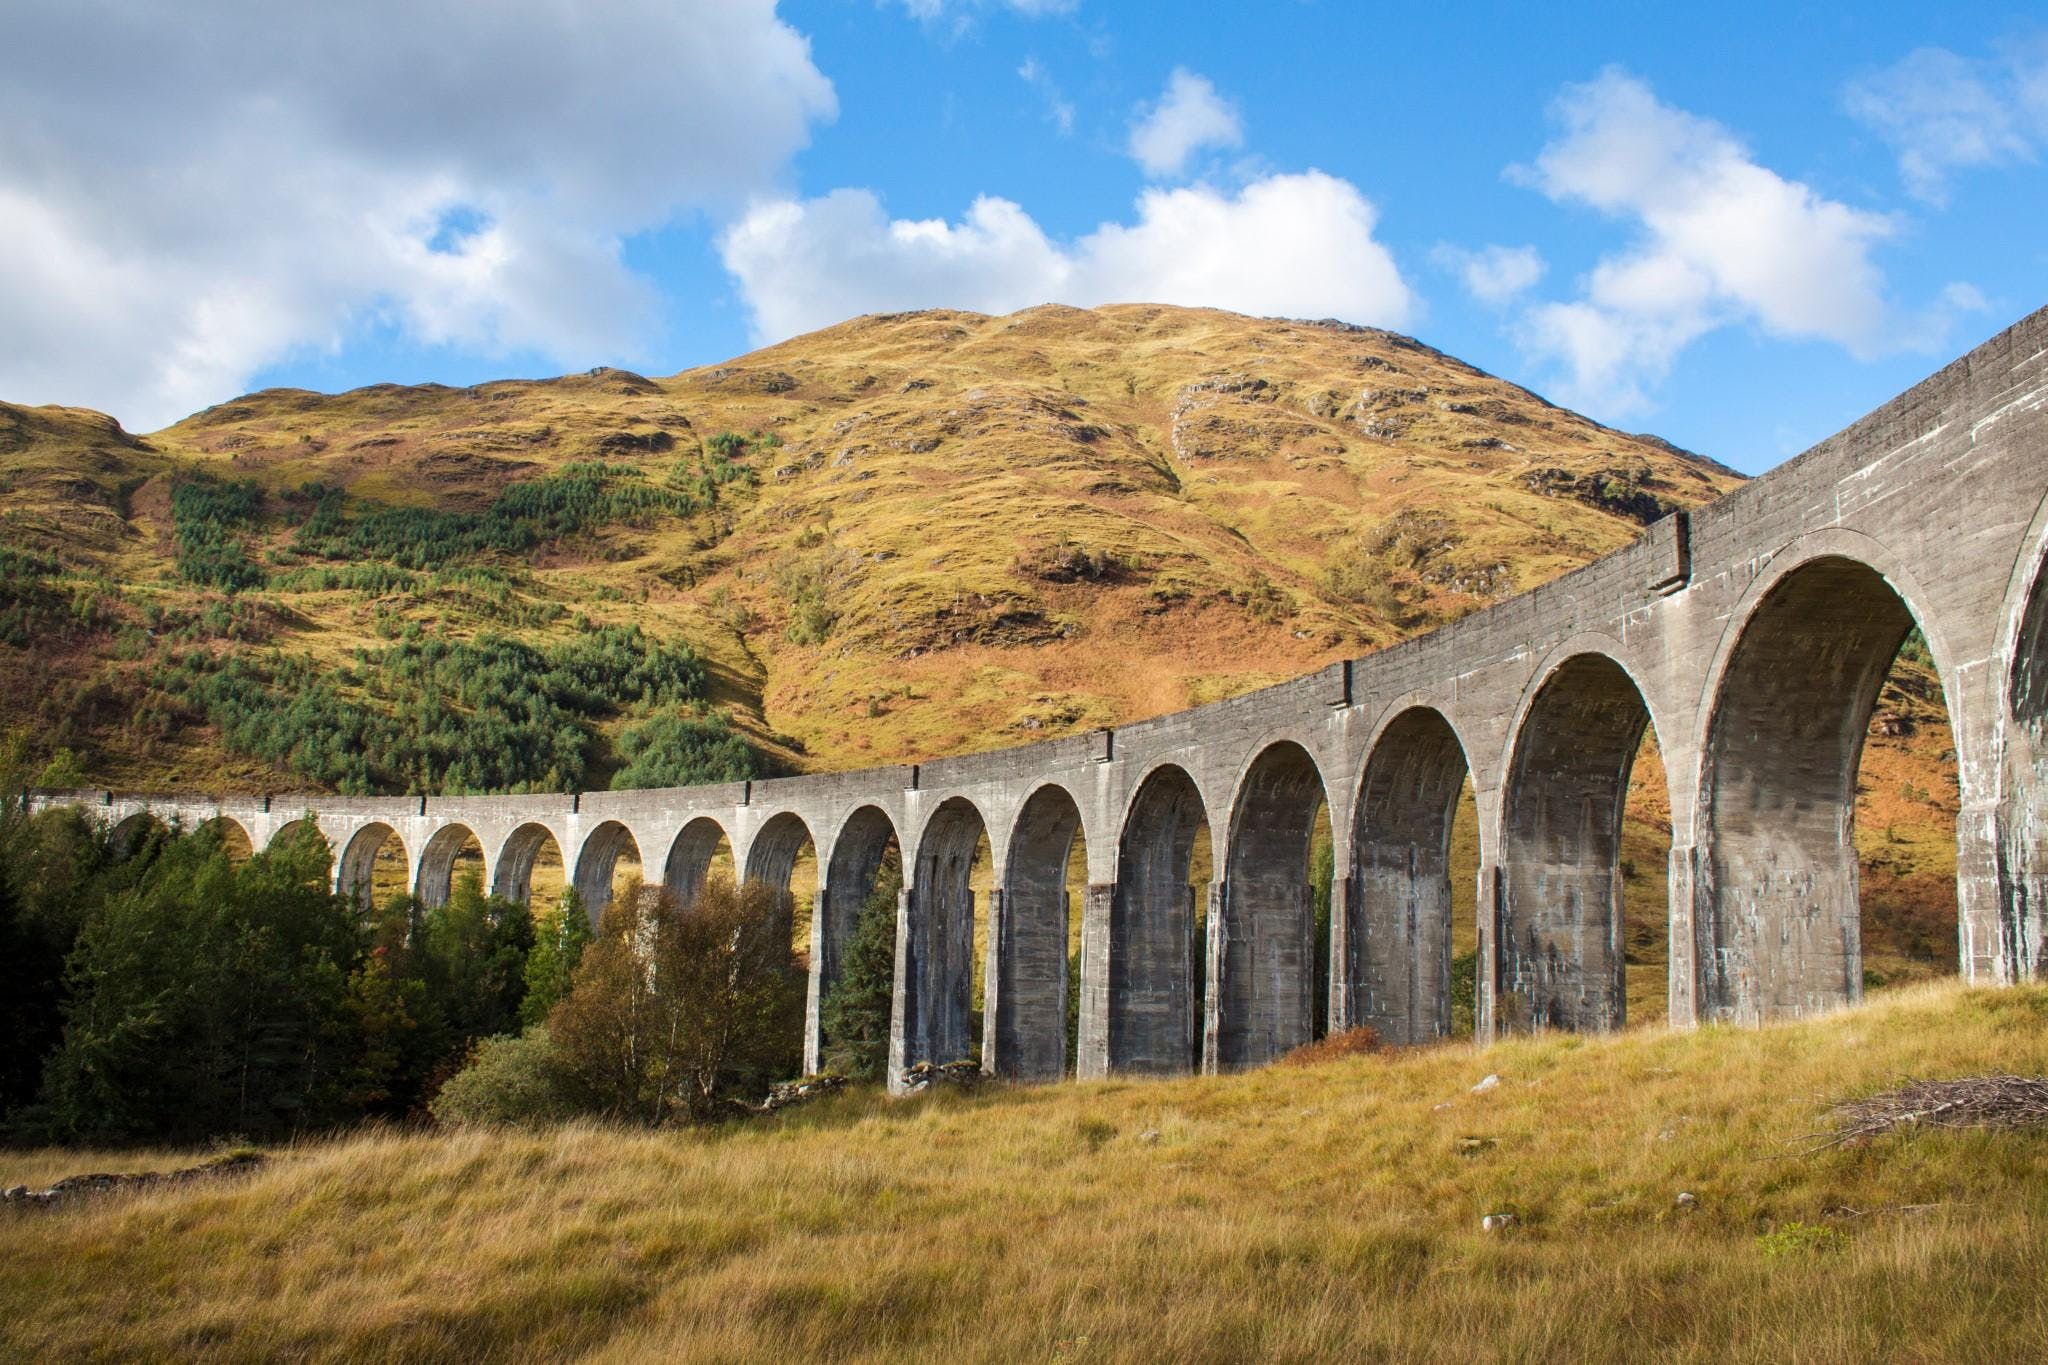 Harry Potter Bridge and Glencoe (£26.00)